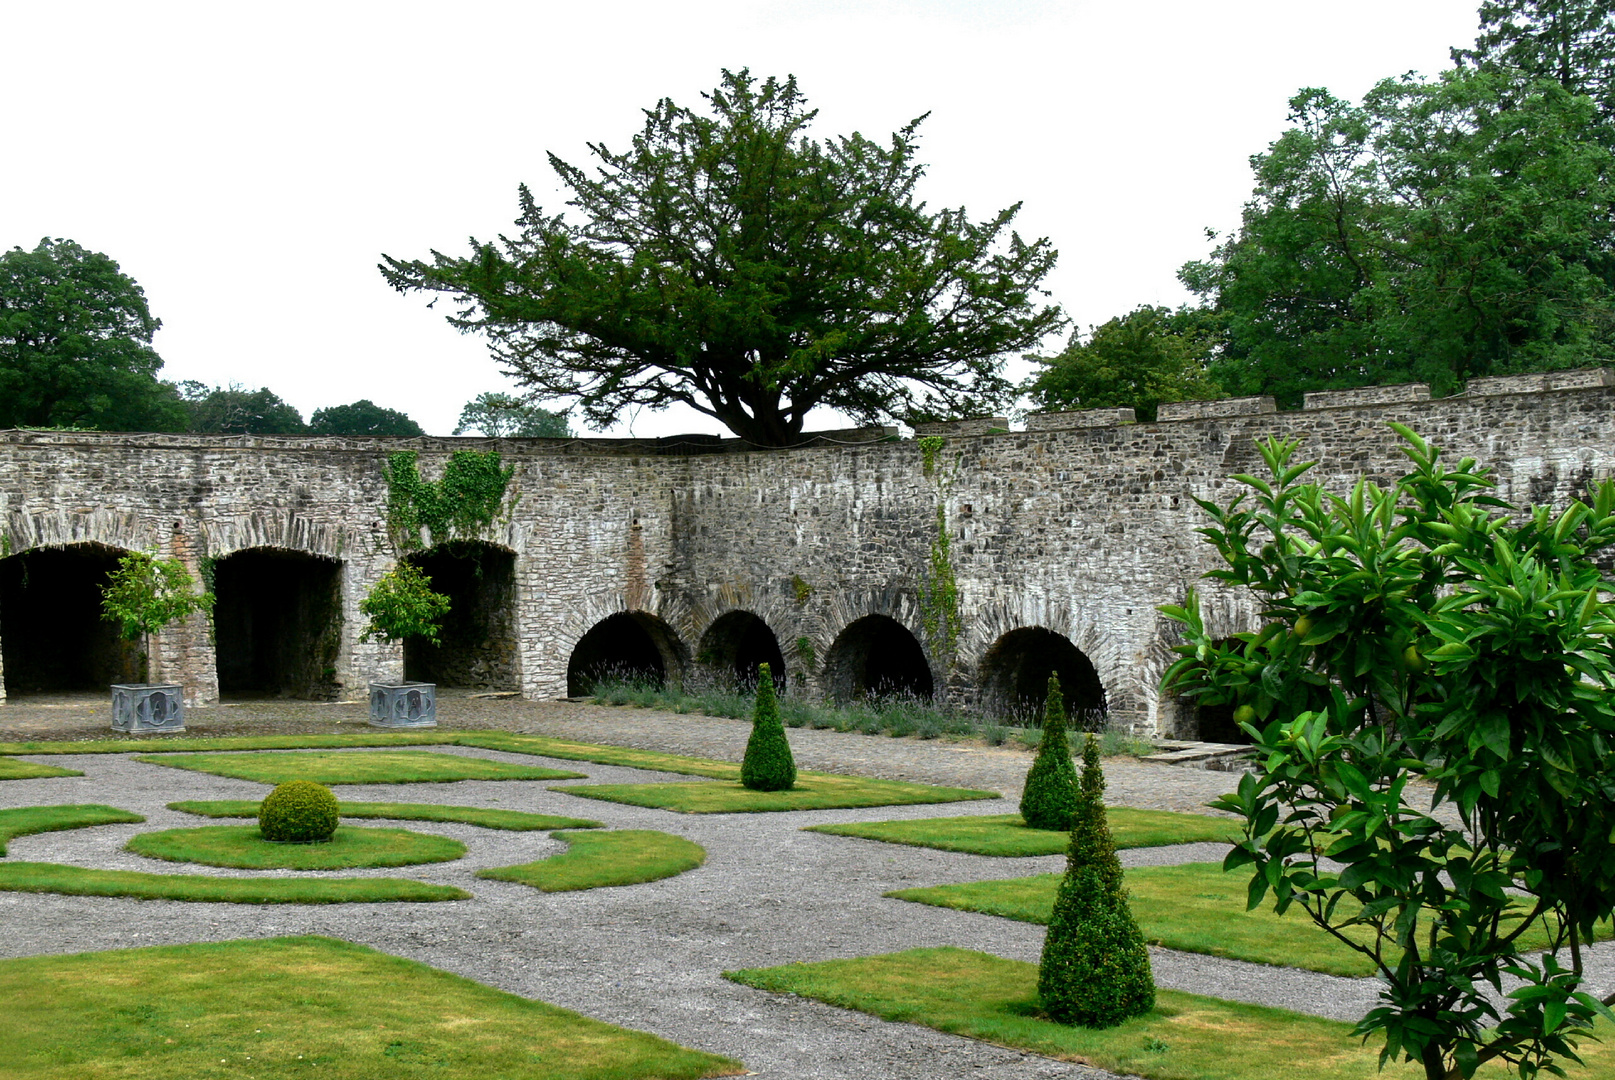 Aberglasney House and Gardens I